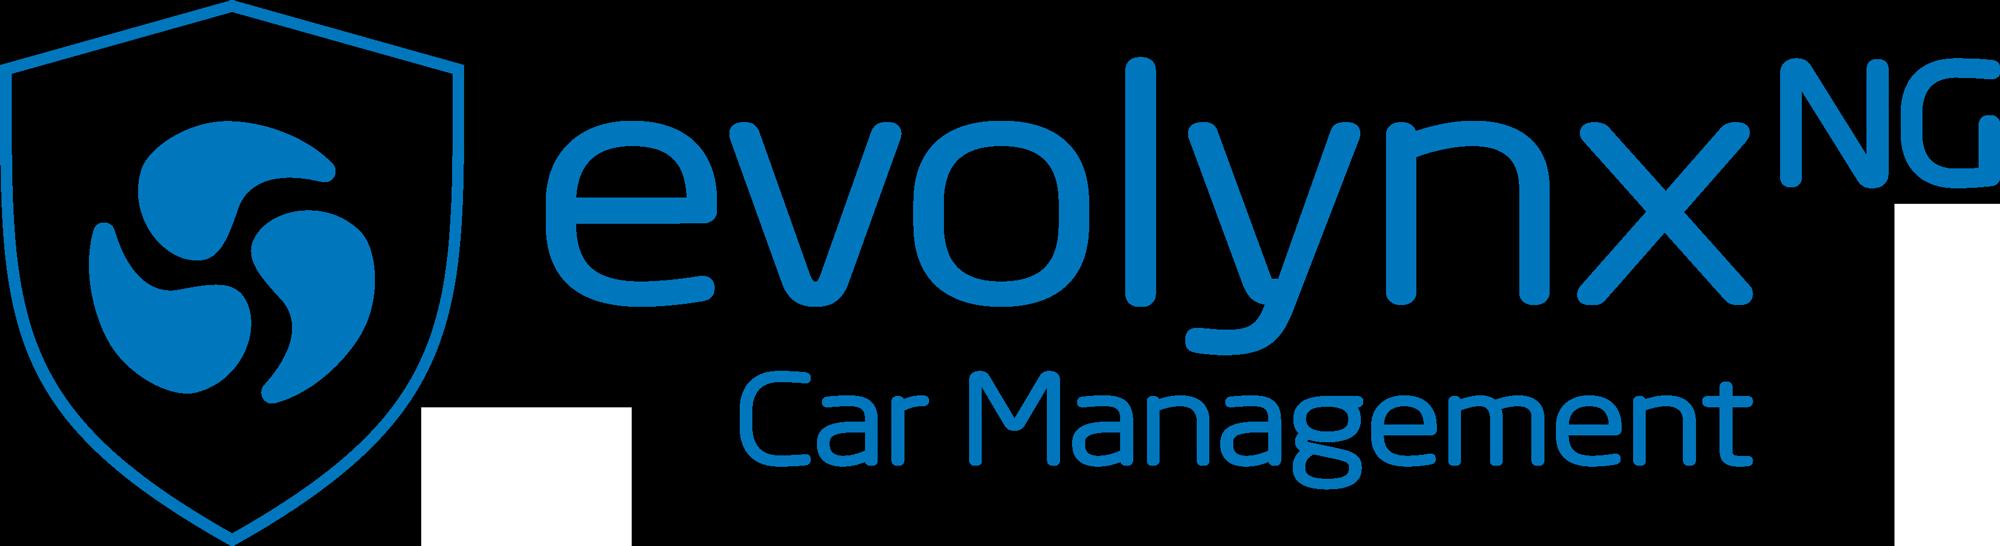 logo evolynxNG software car management